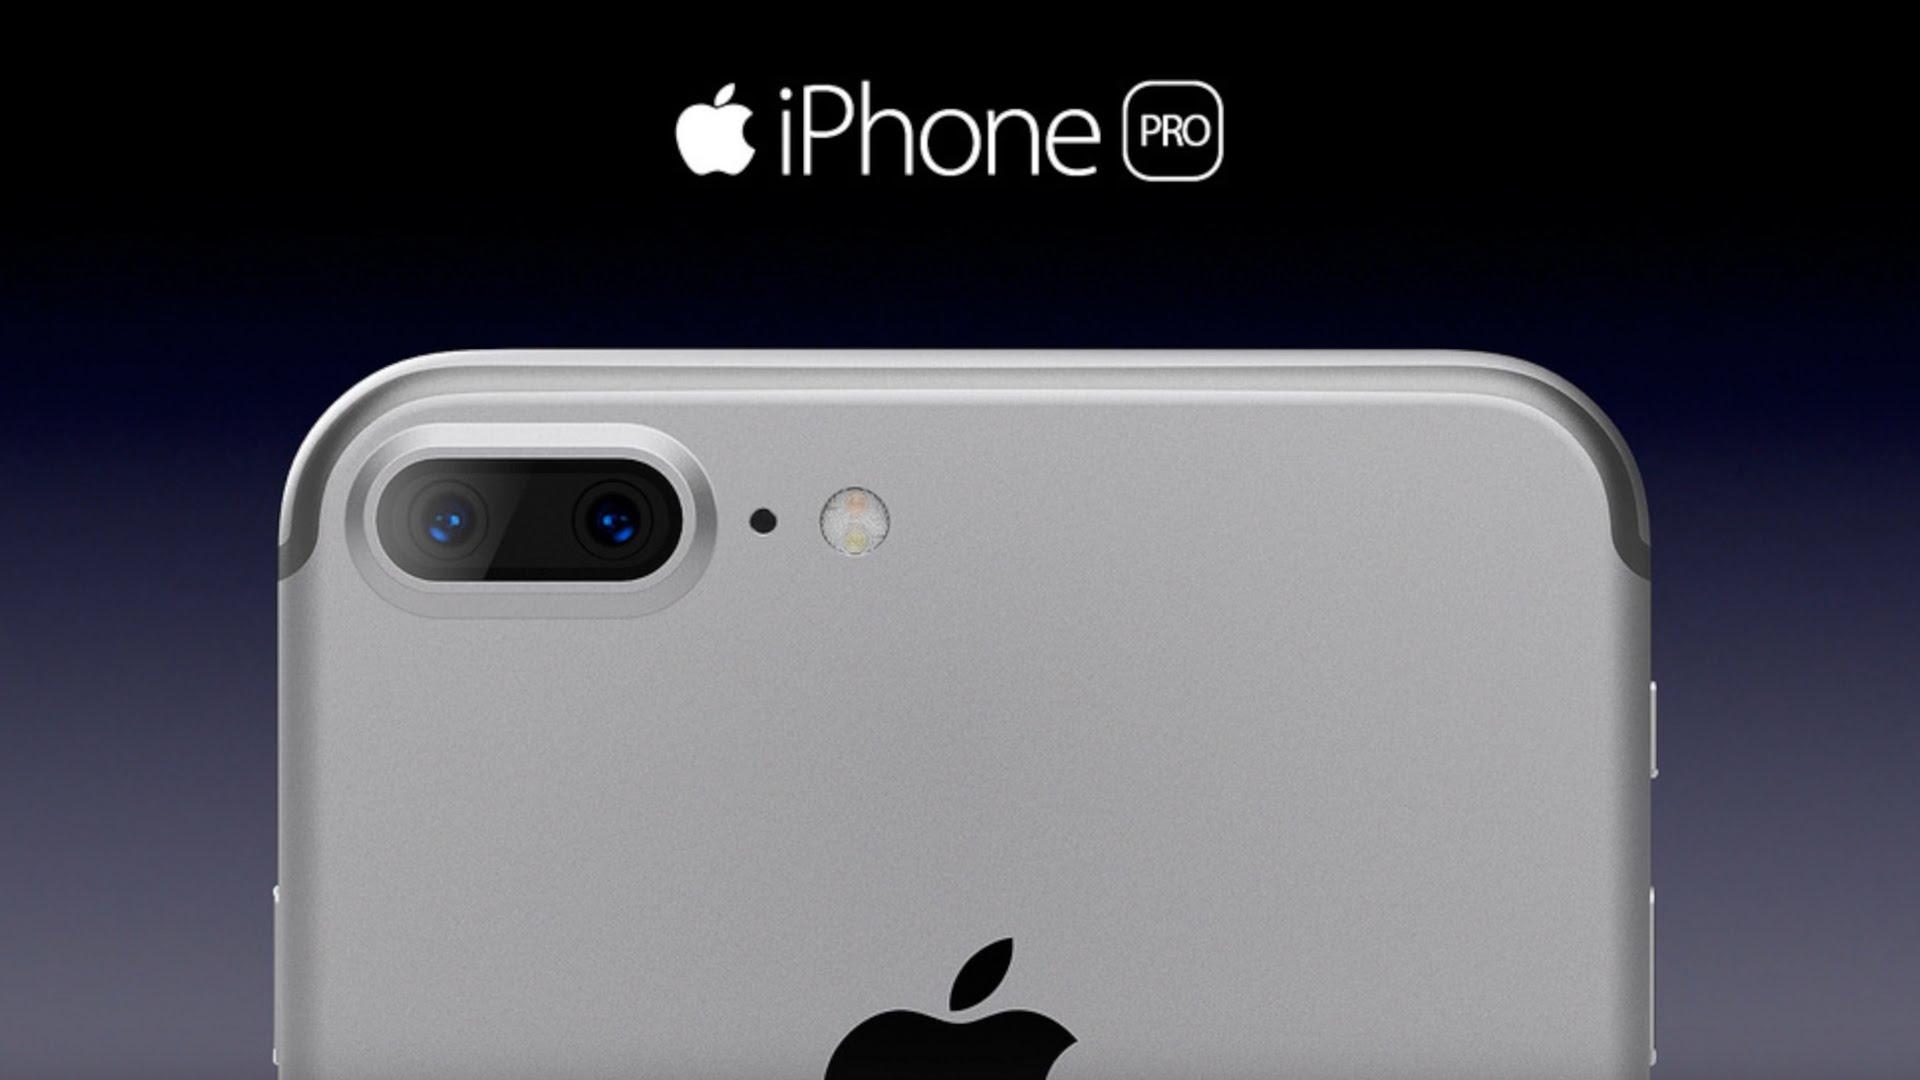 Когда будет дата выхода и релиза iPhone 7 Pro?